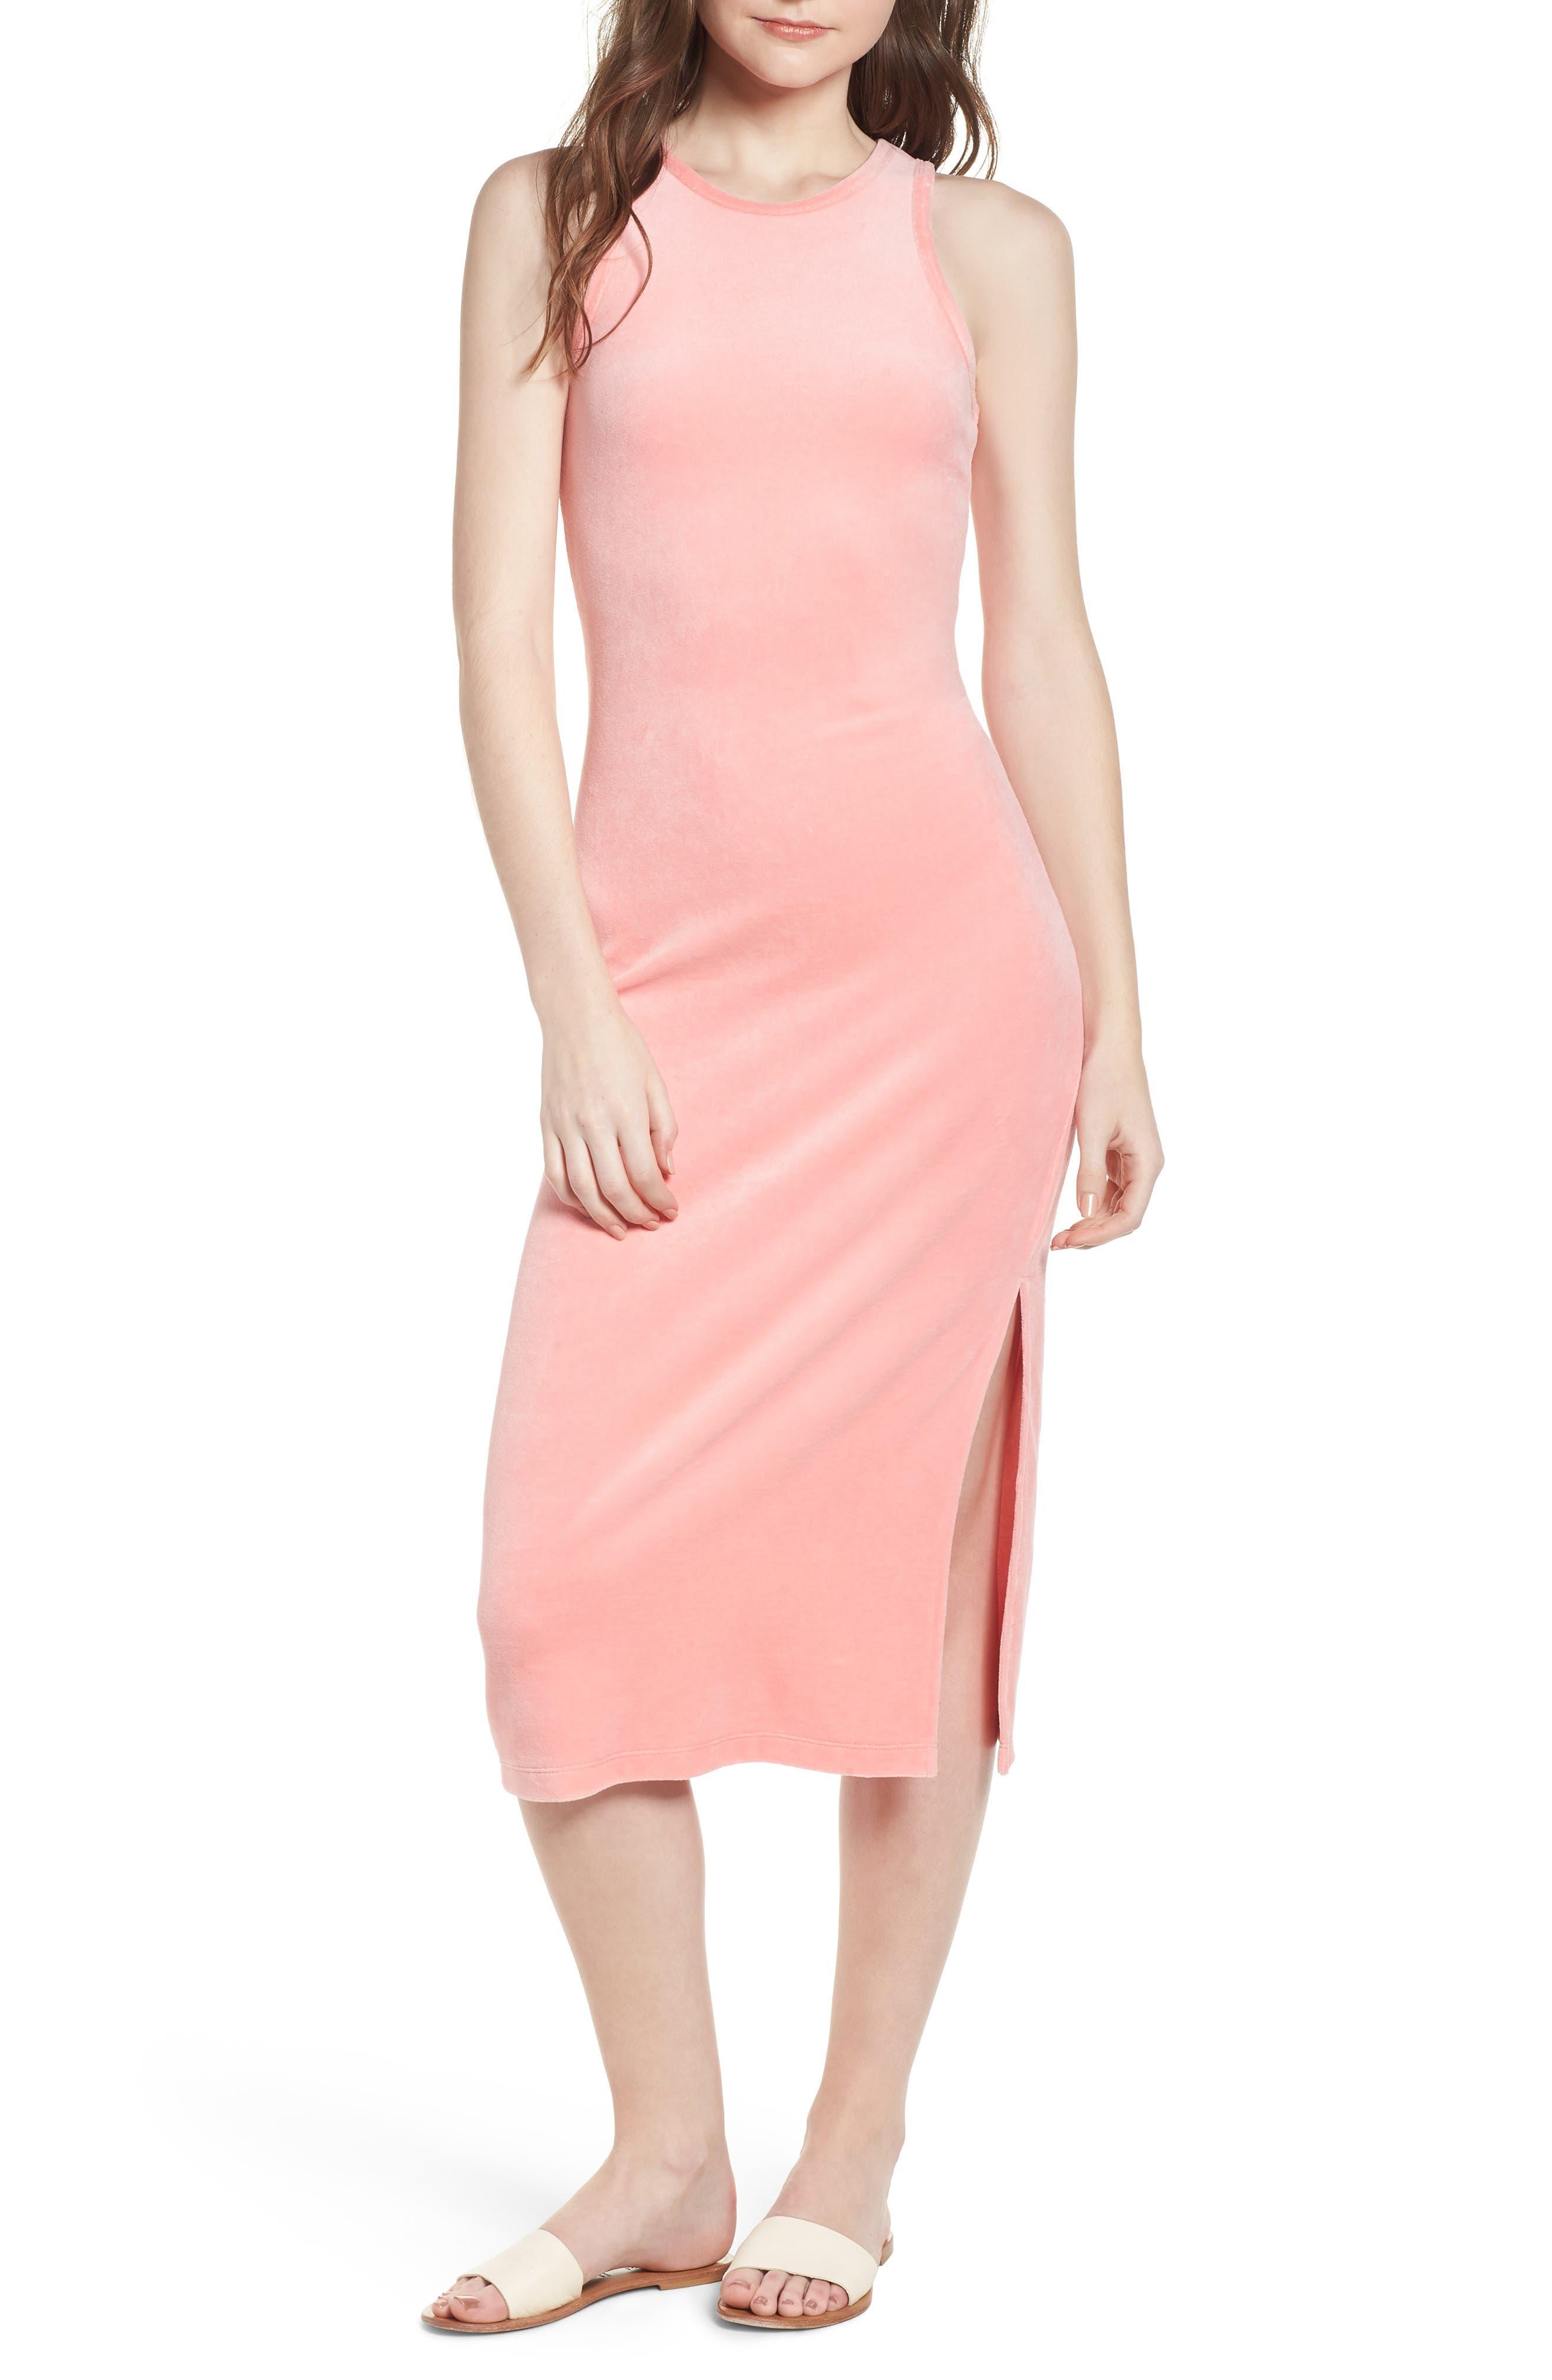 Stretch Velour Tank Midi Dress,                             Main thumbnail 1, color,                             Sorbet Pink